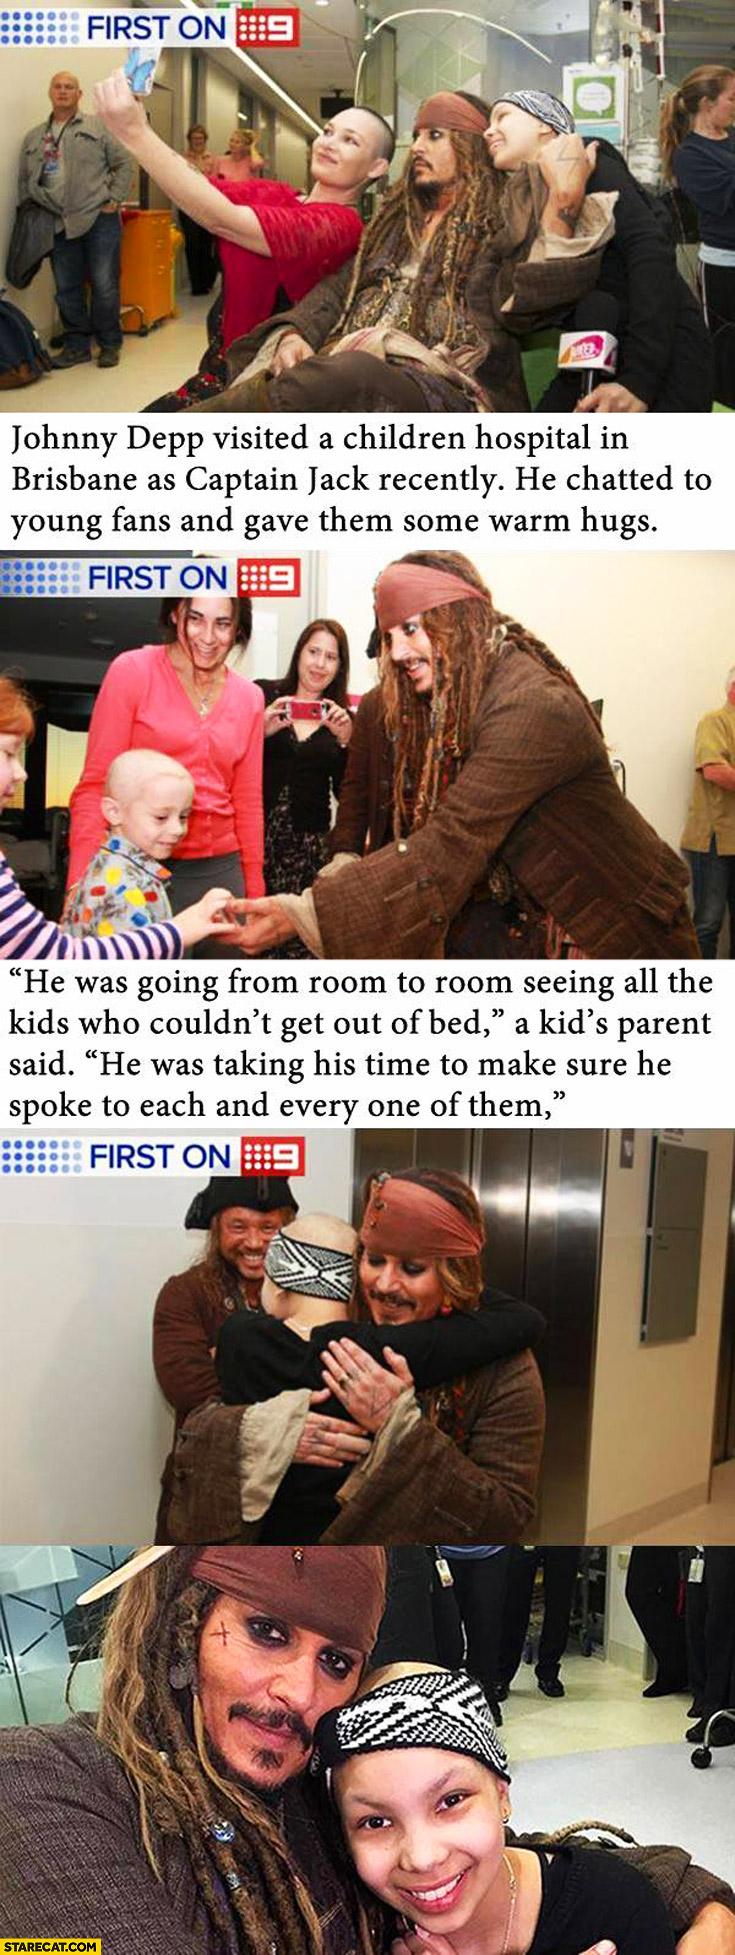 Johnny Depp as Jack Sparrow in children hospital in Brisbane